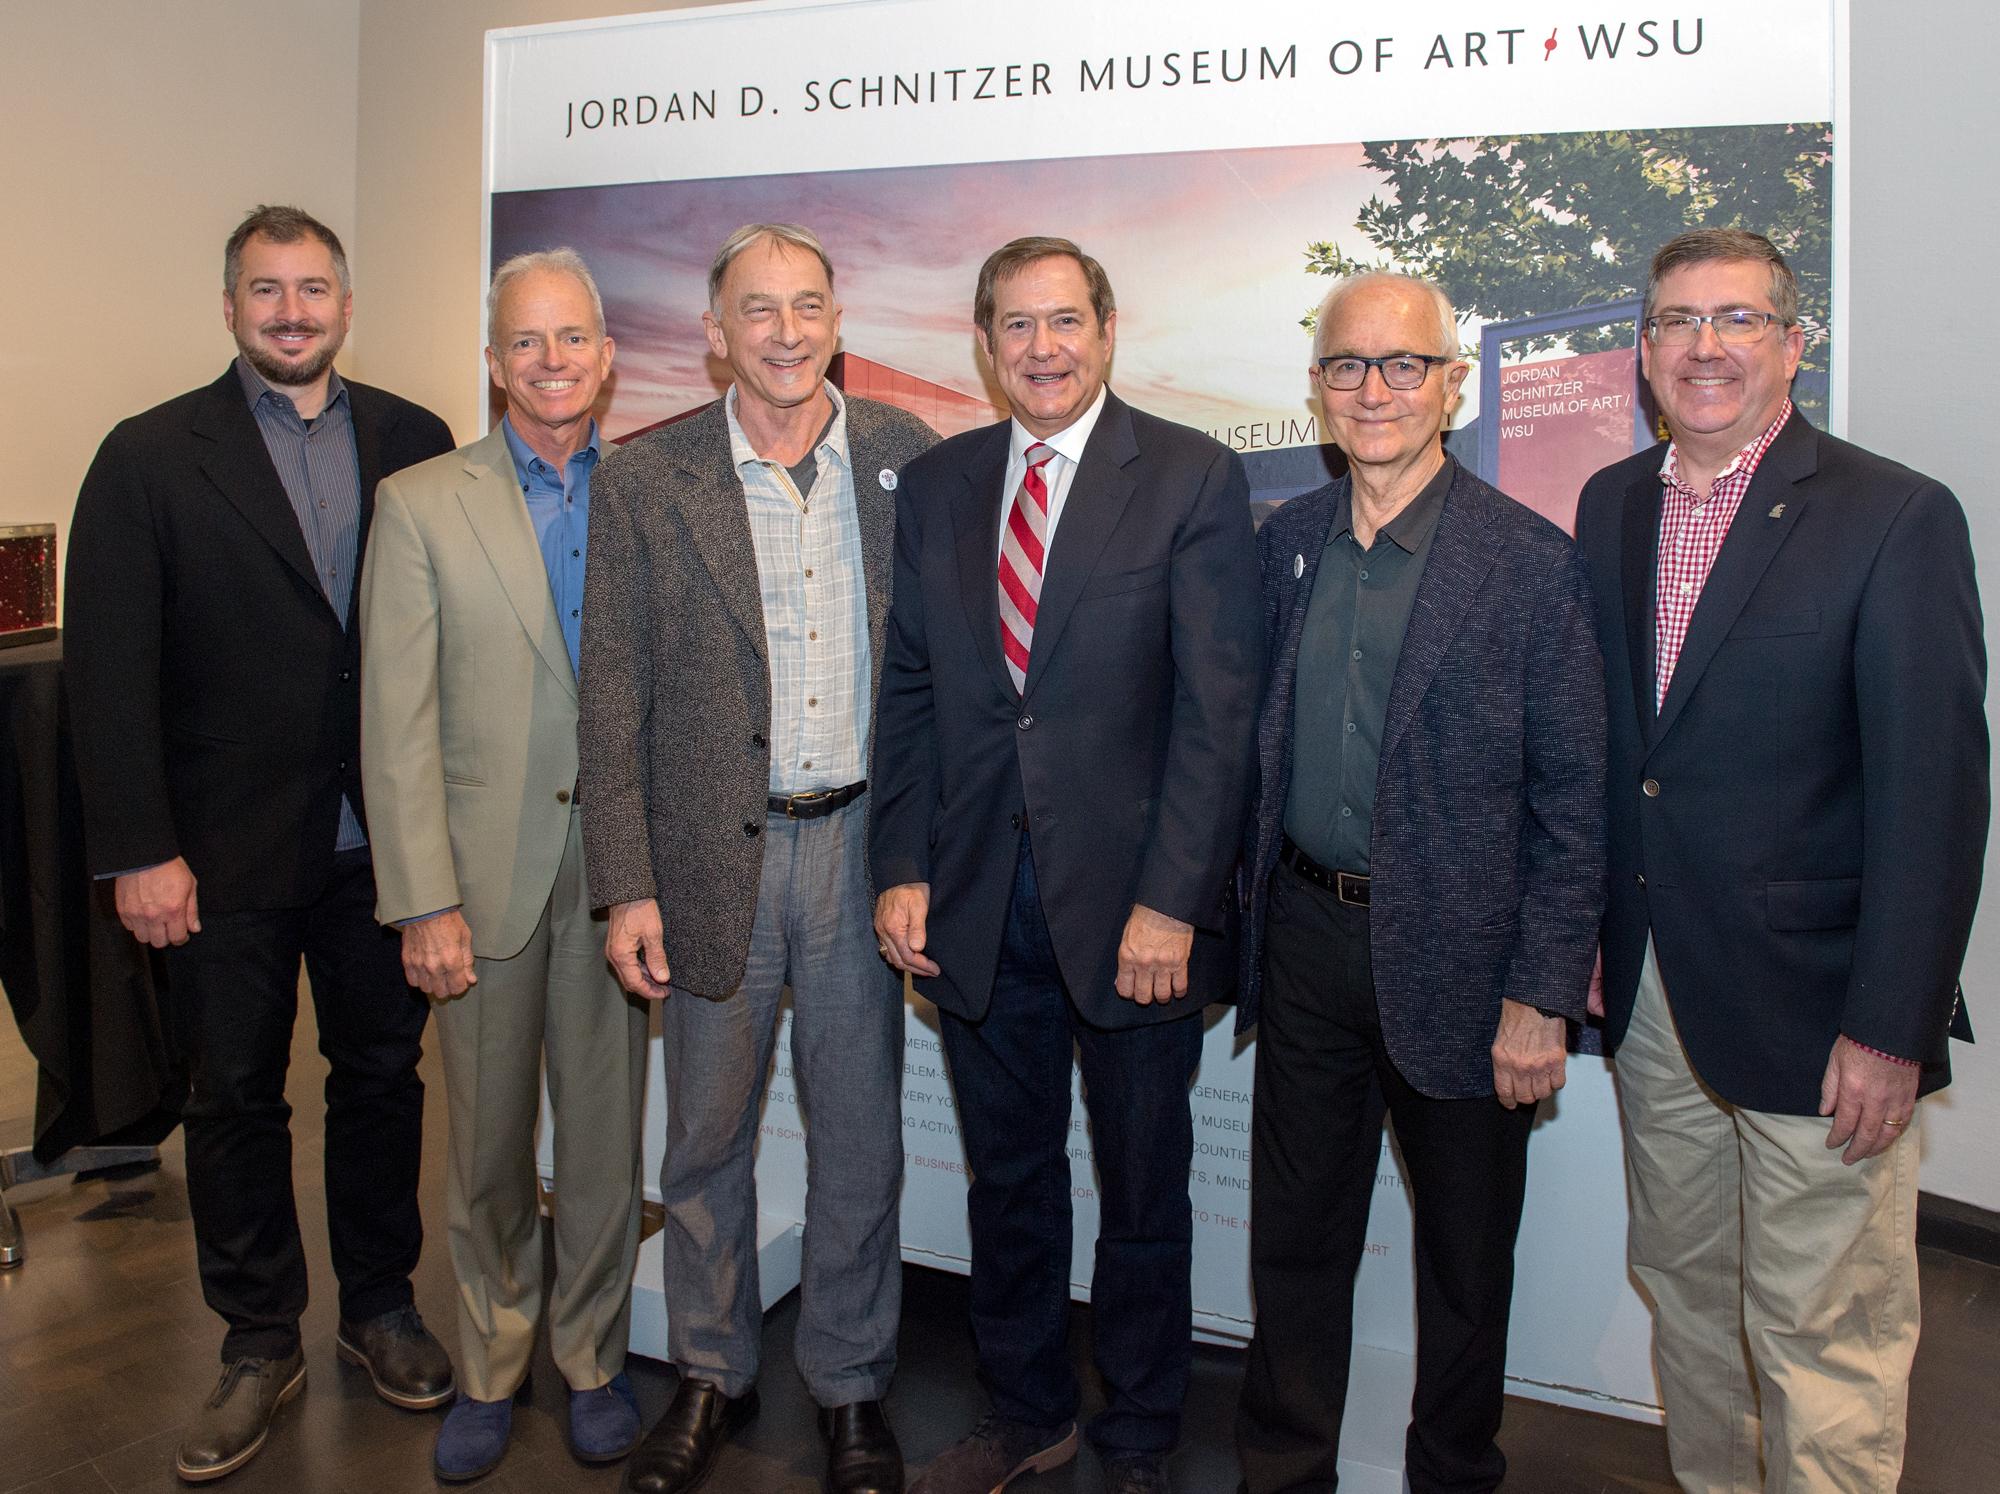 Steven Rainville, Olson/Kundig; H.S. Wright, III; Chris Bruce, Director, Museum of Art/WSU; Jordan D. Schnitzer, Philanthropist; Jim Olson, Olson/Kundig; WSU President, Kirk Schulz